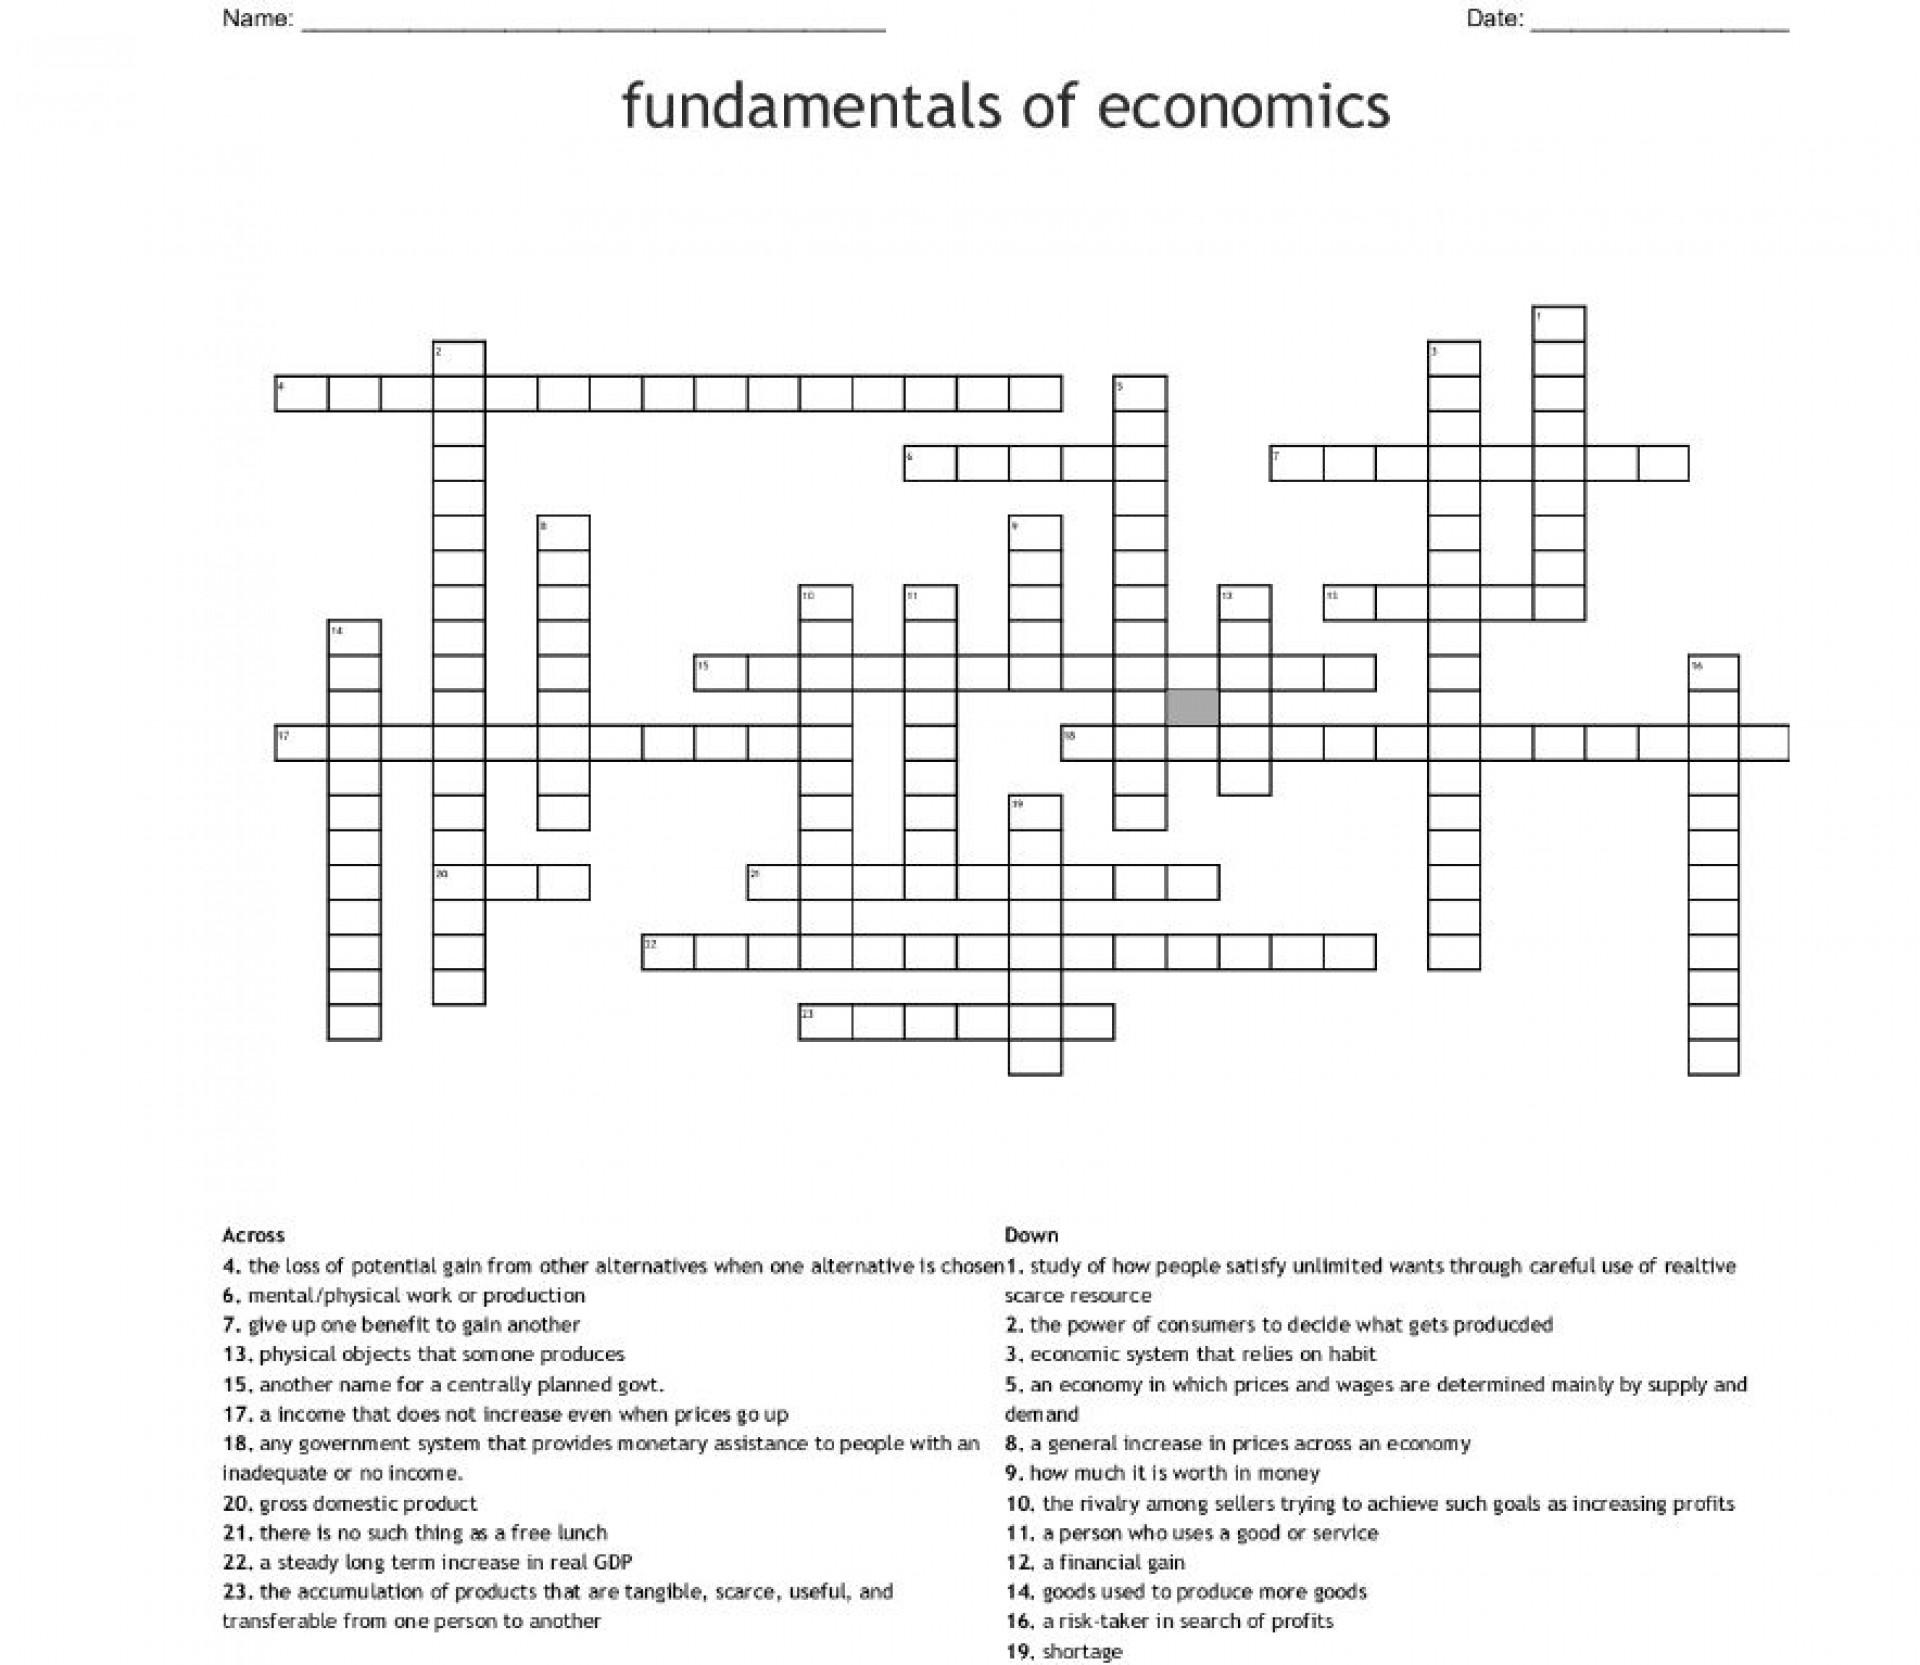 001 Imposing Prosperity Crossword Picture  Sound Clue Material1920